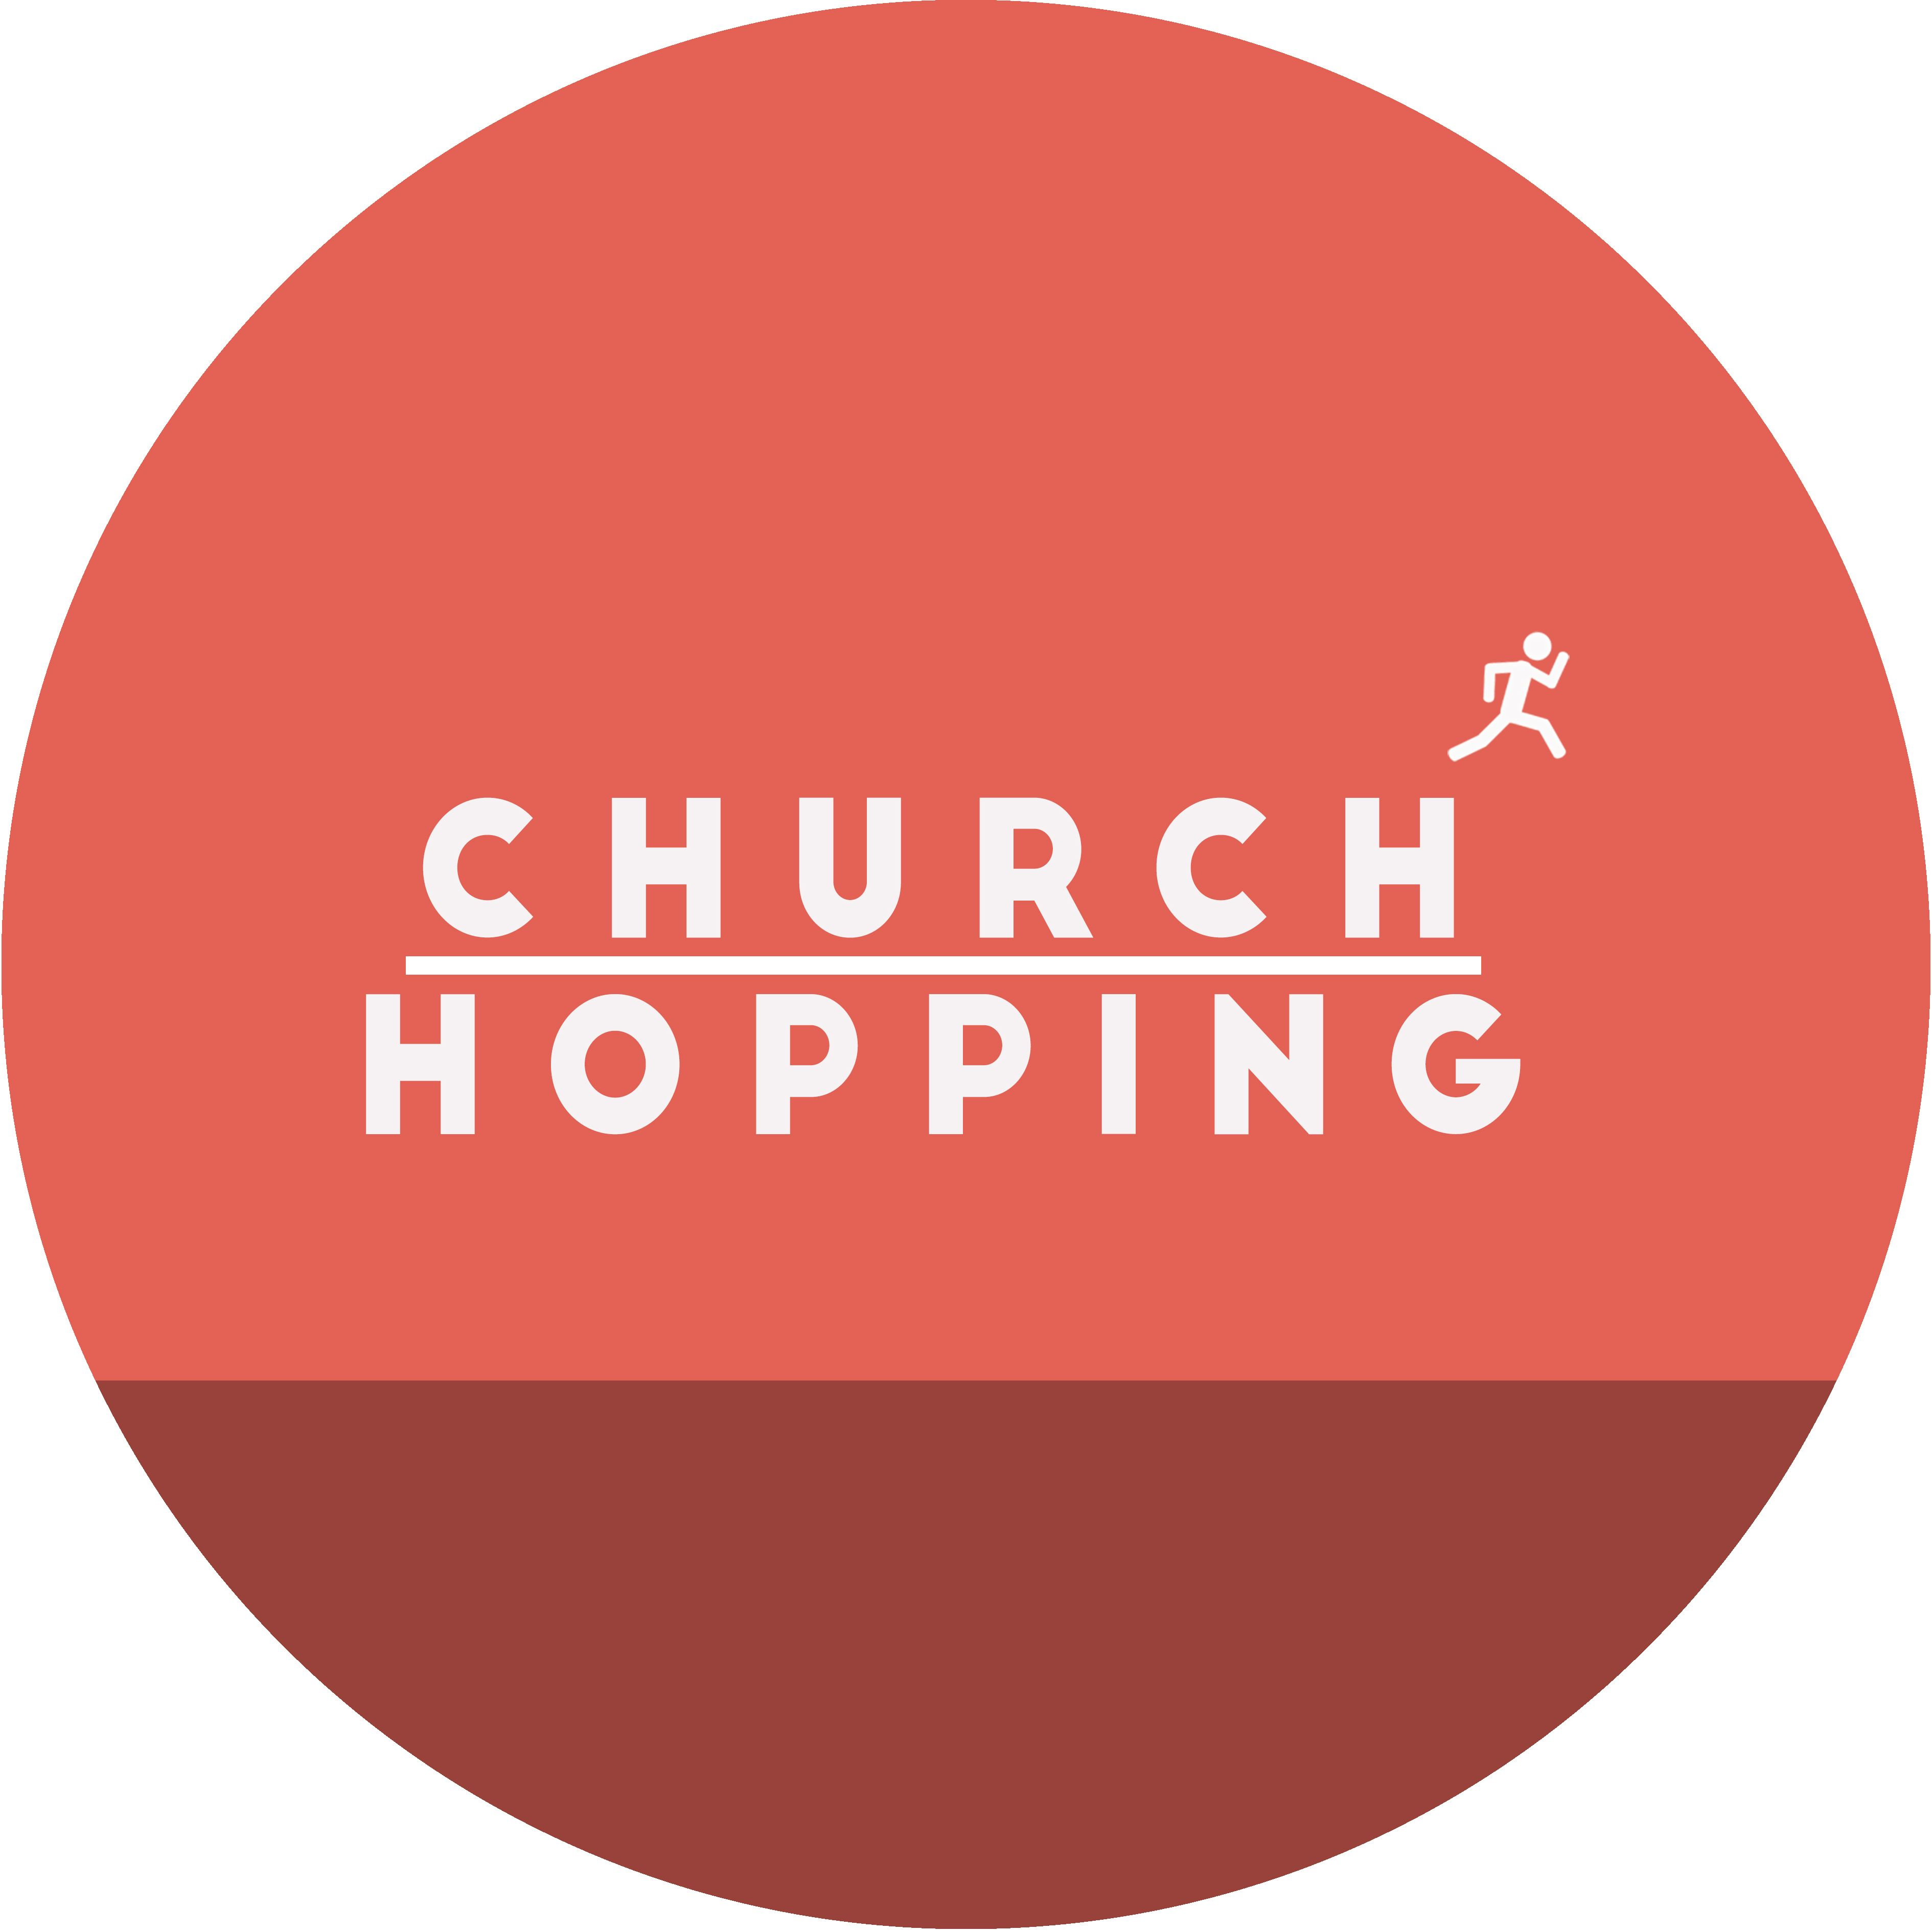 Church Hopping